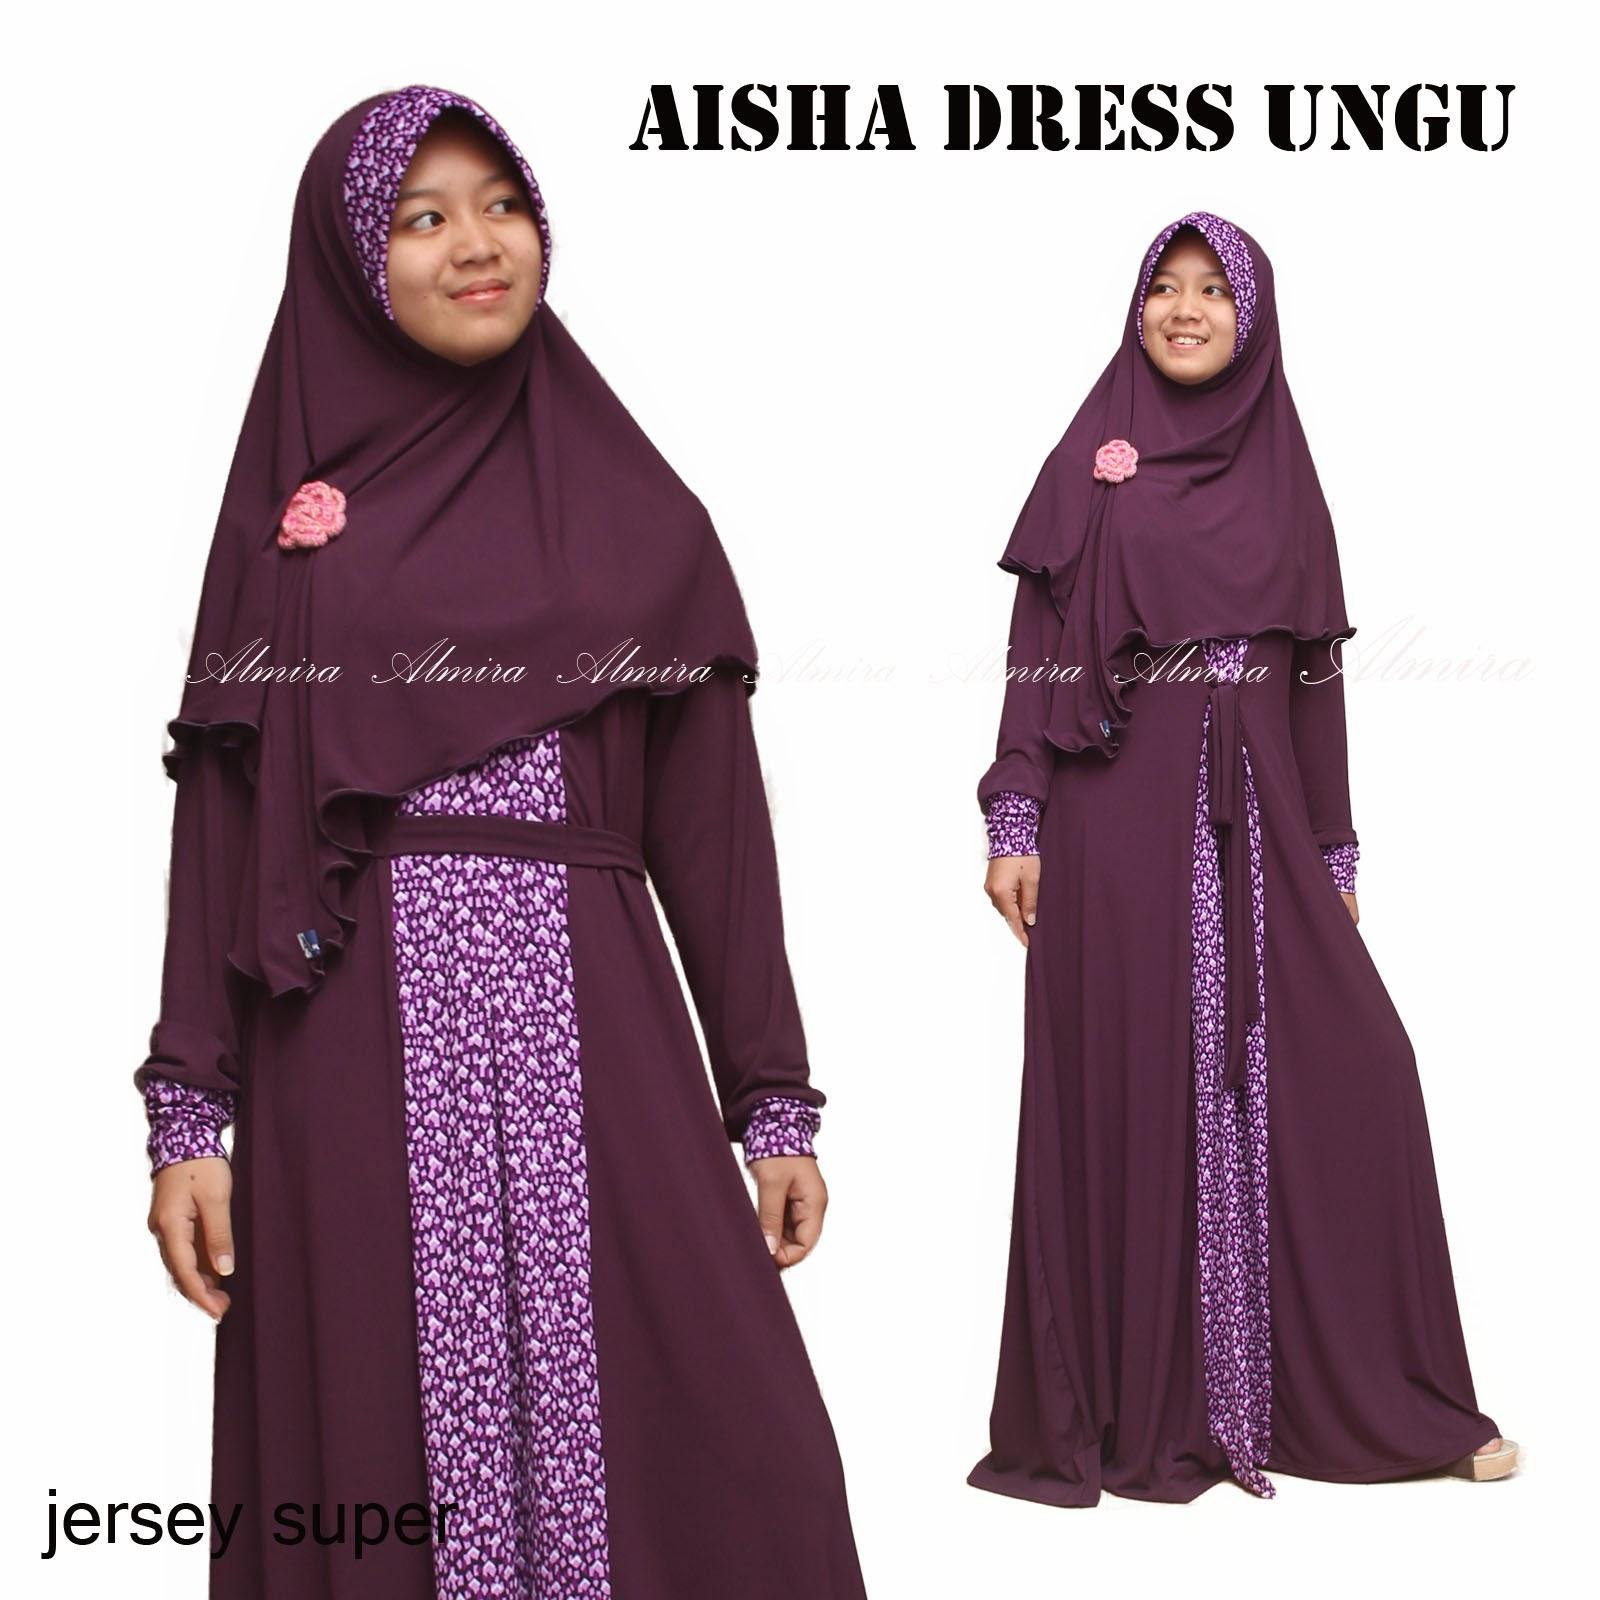 aisha dress ungu jersey baju muslim busana muslimah busui friendly hijab syari hijaber gamis griyaraditya